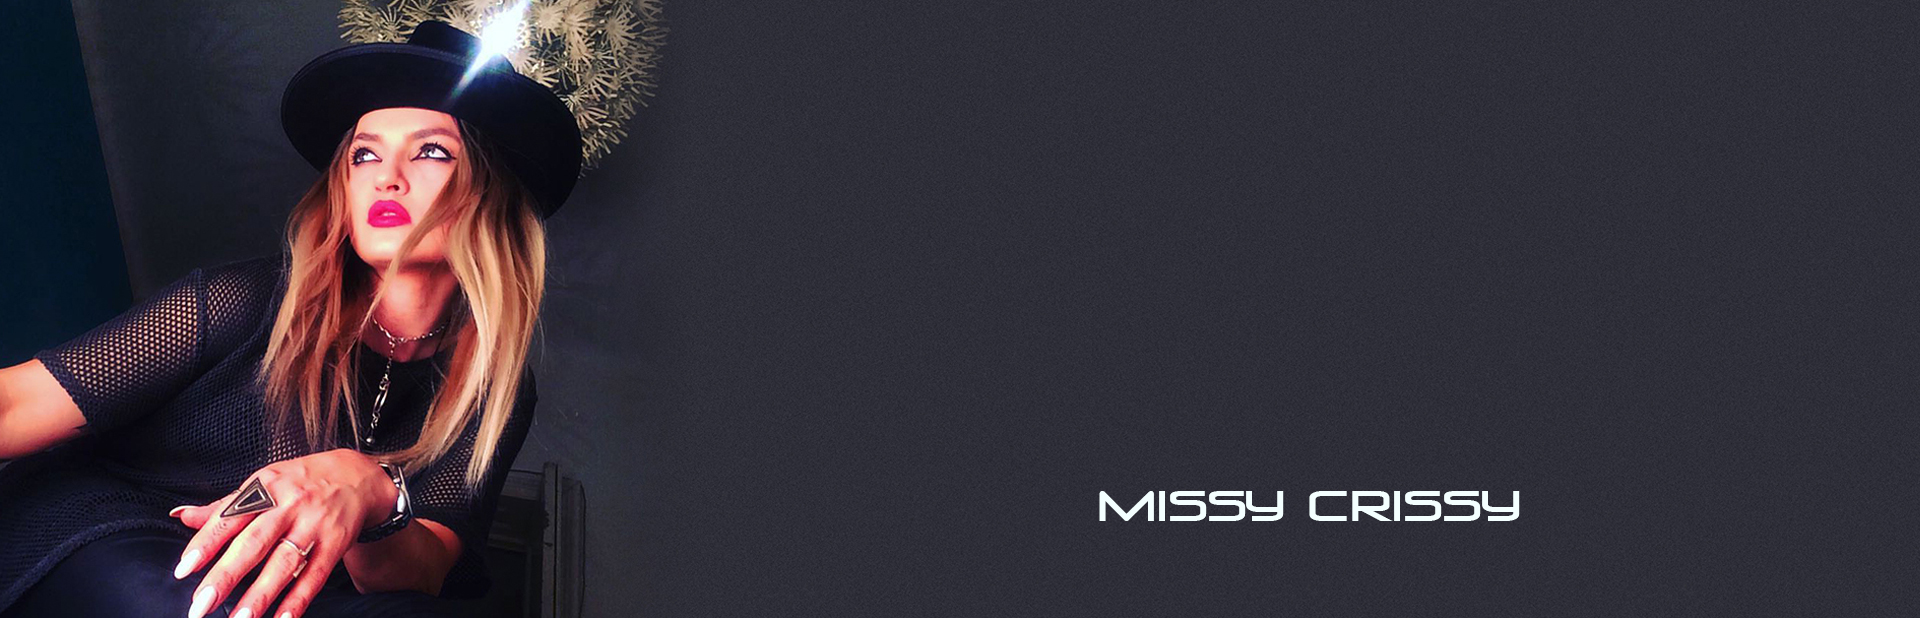 missycrissy-03